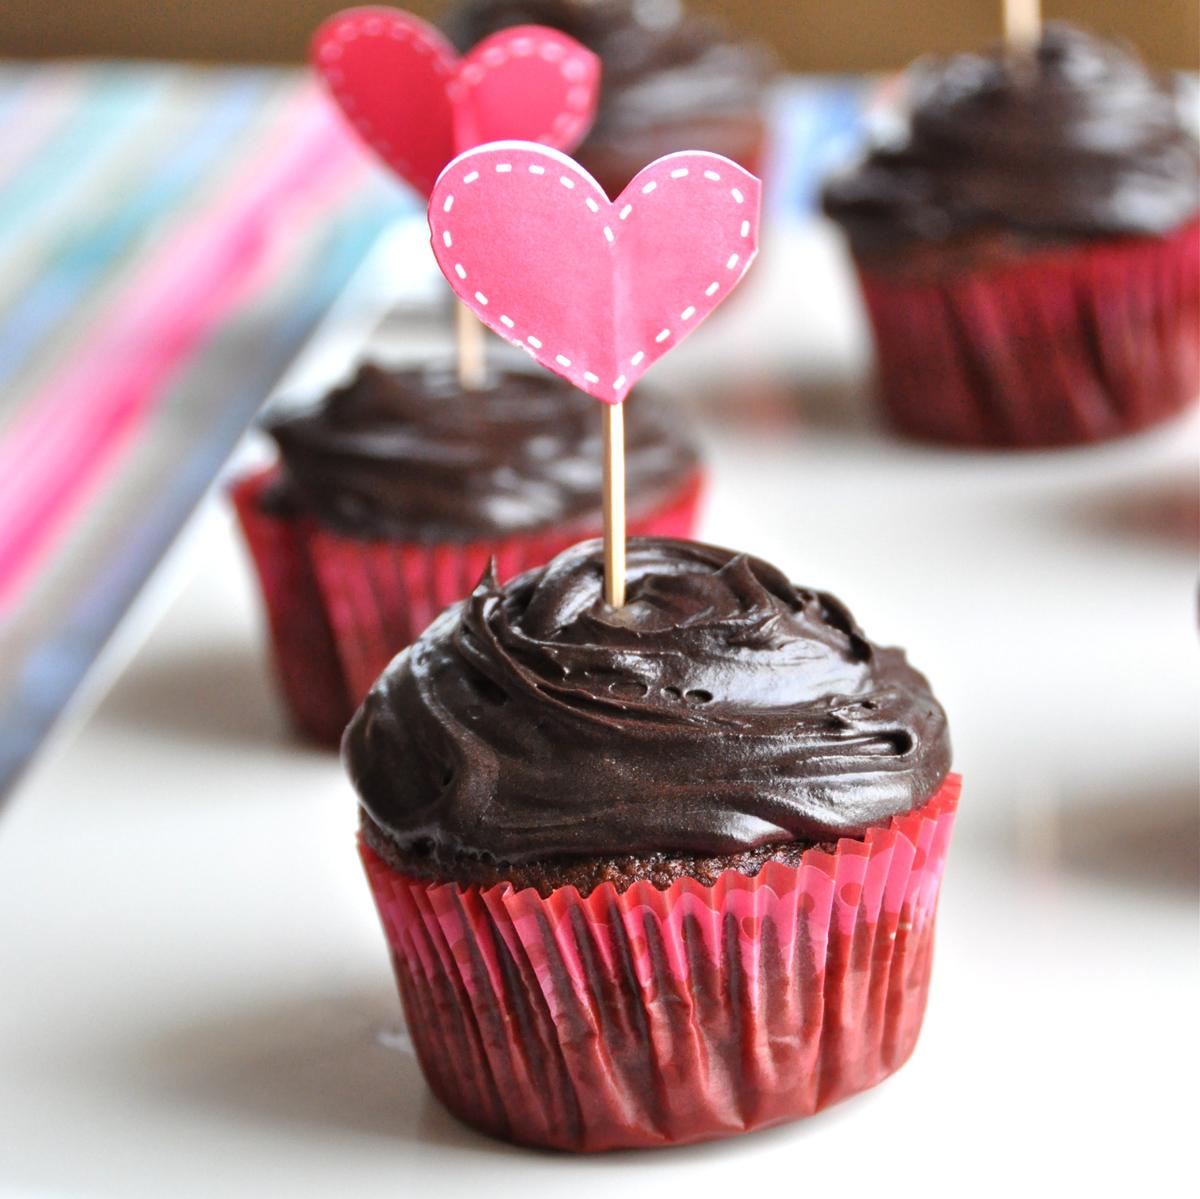 Double Chocolate Espresso Cupcakes recipe on Food52.com